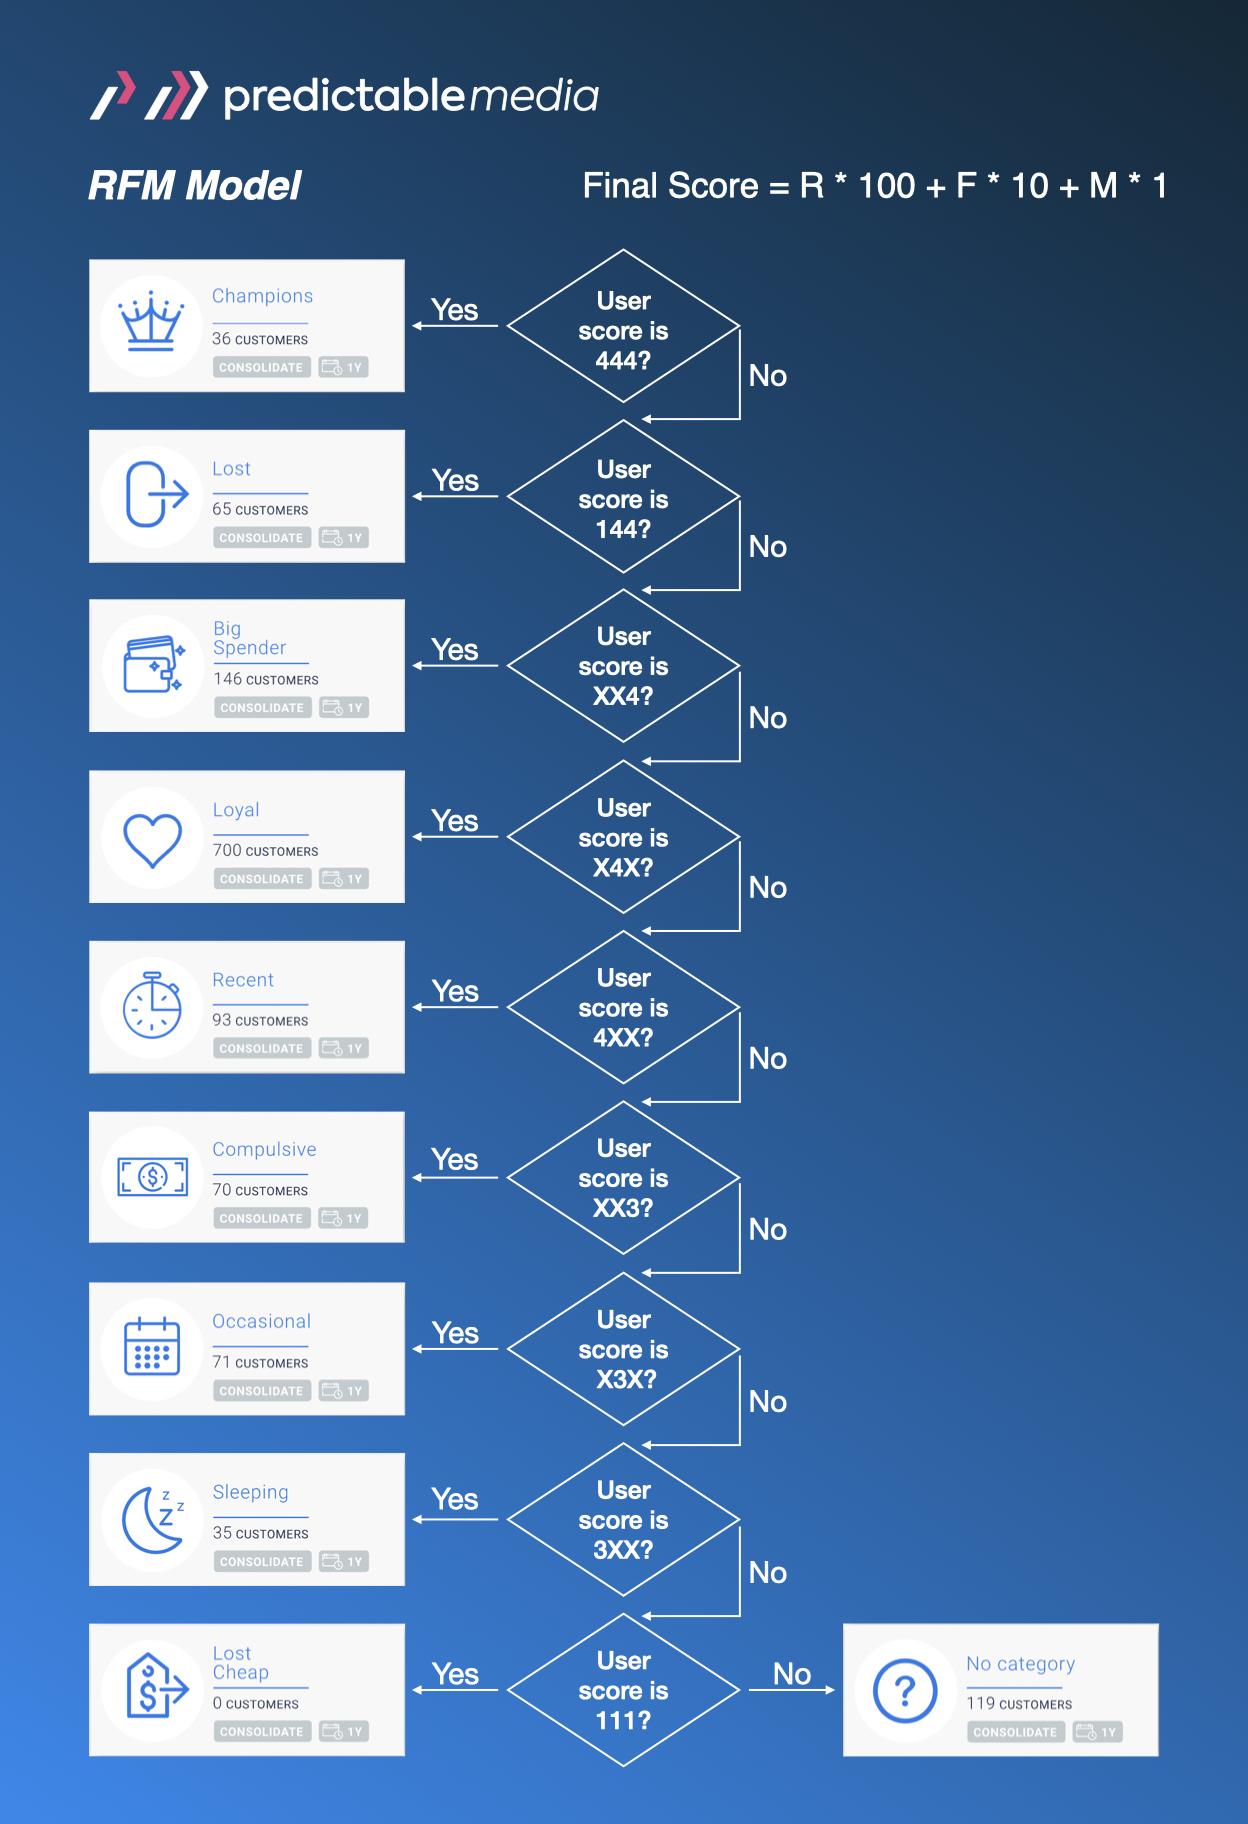 RFM model by Predictable Media, decision tree.